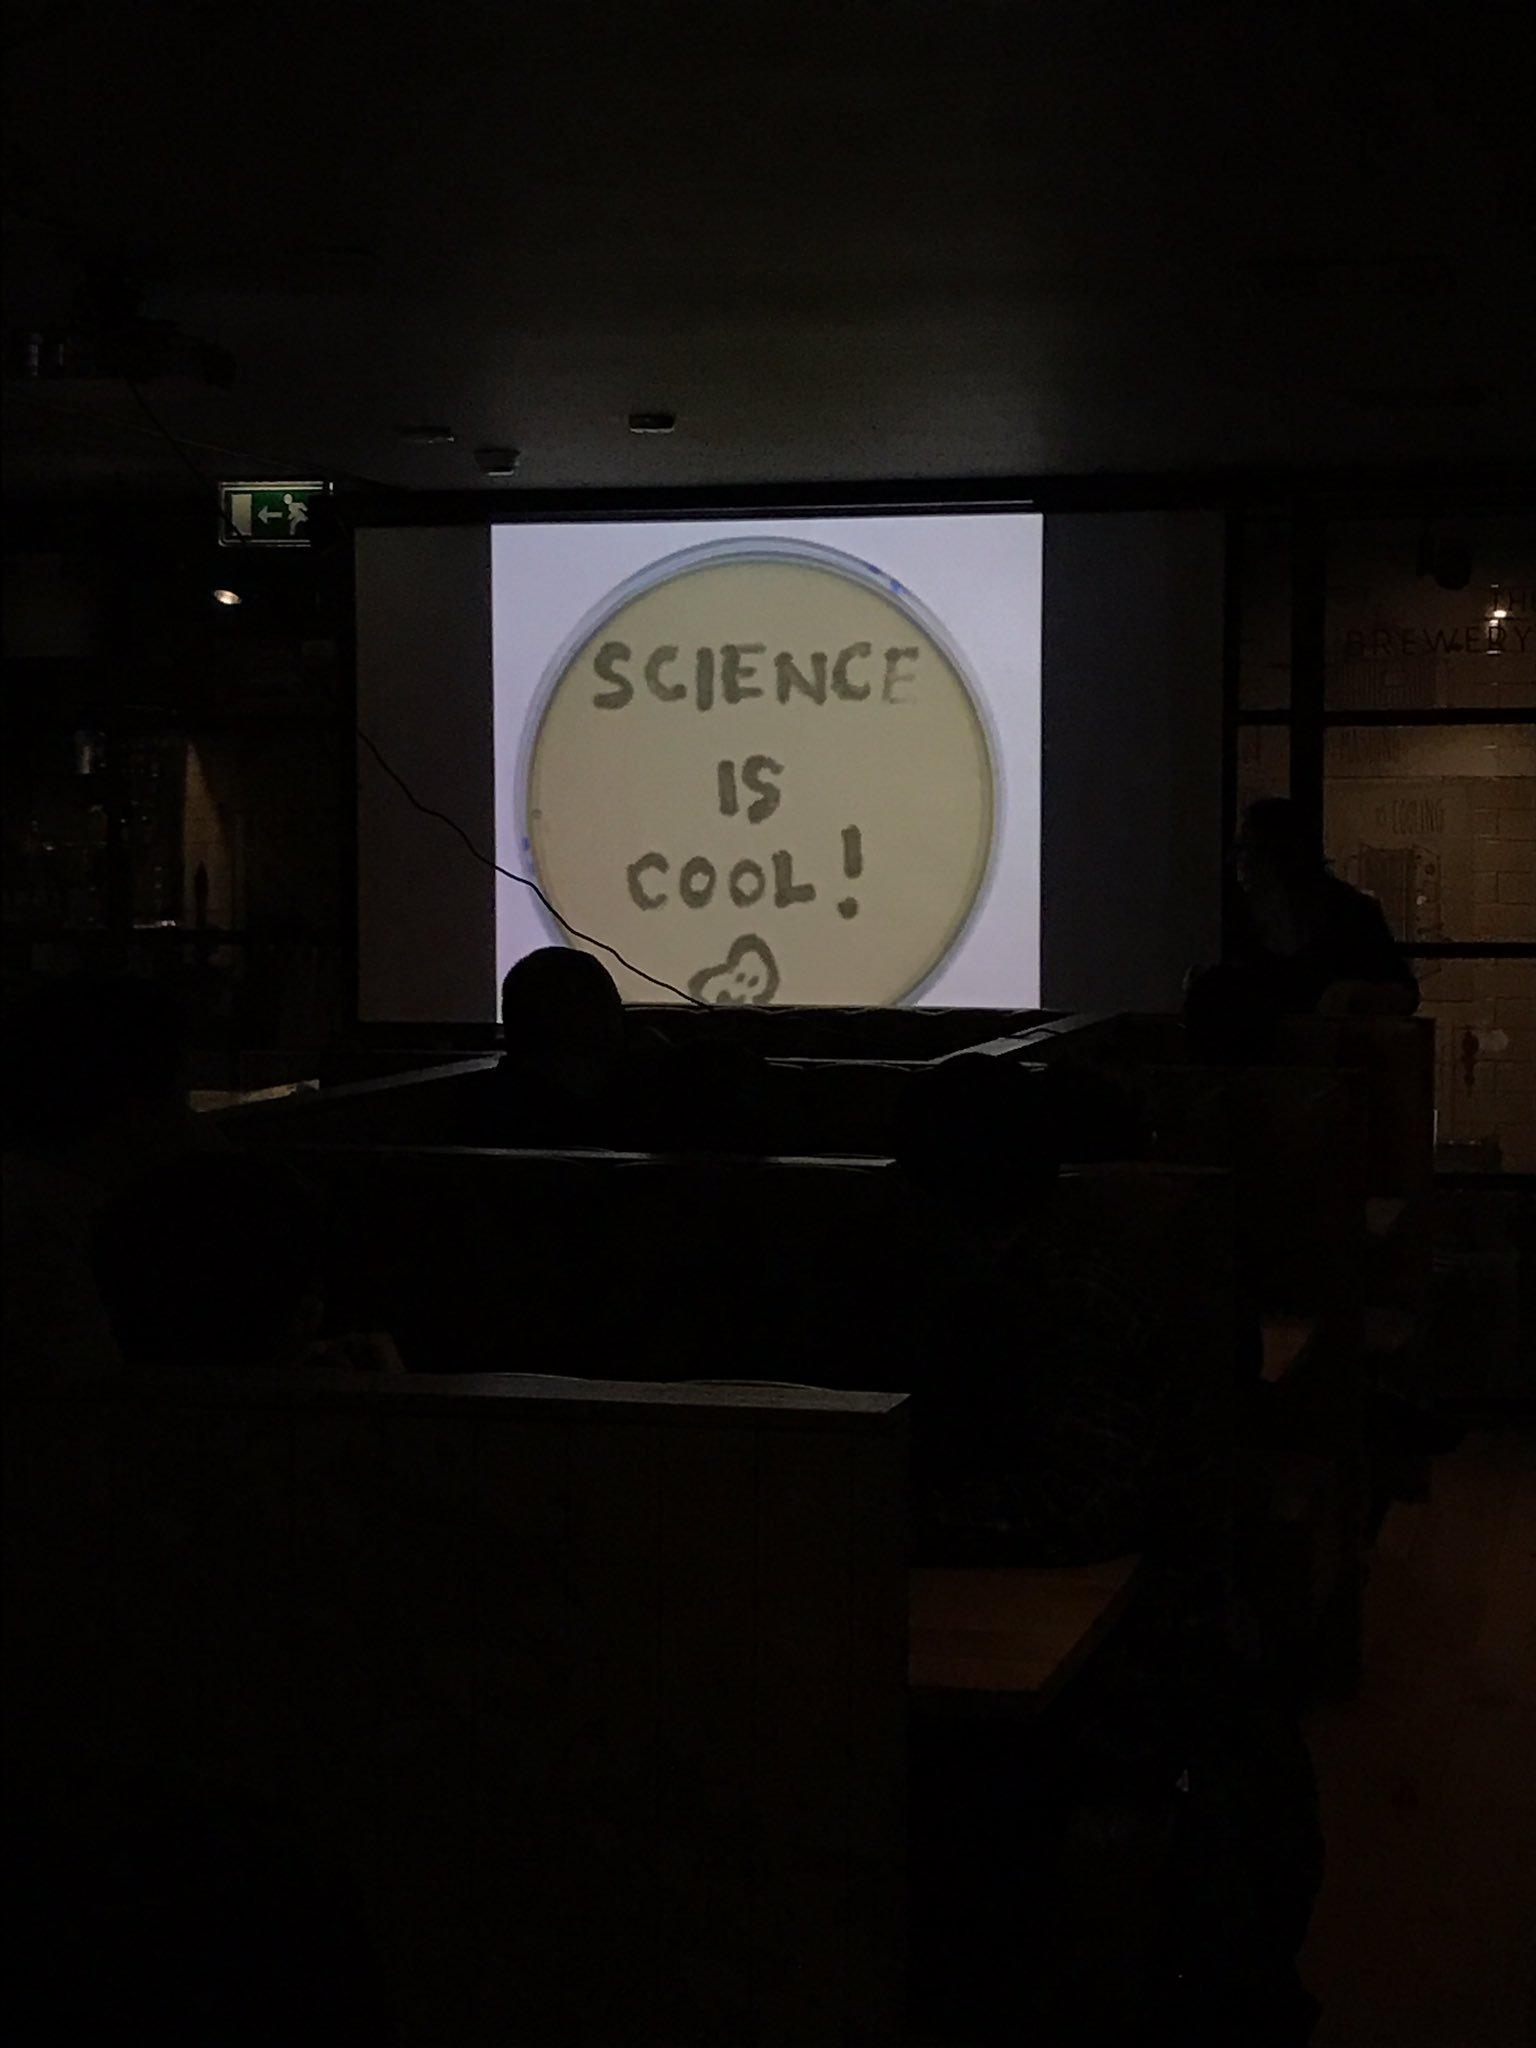 """Science is cool!"" - inspiring talk by @Dundeebora #MakeShare https://t.co/DboIStZXgA"